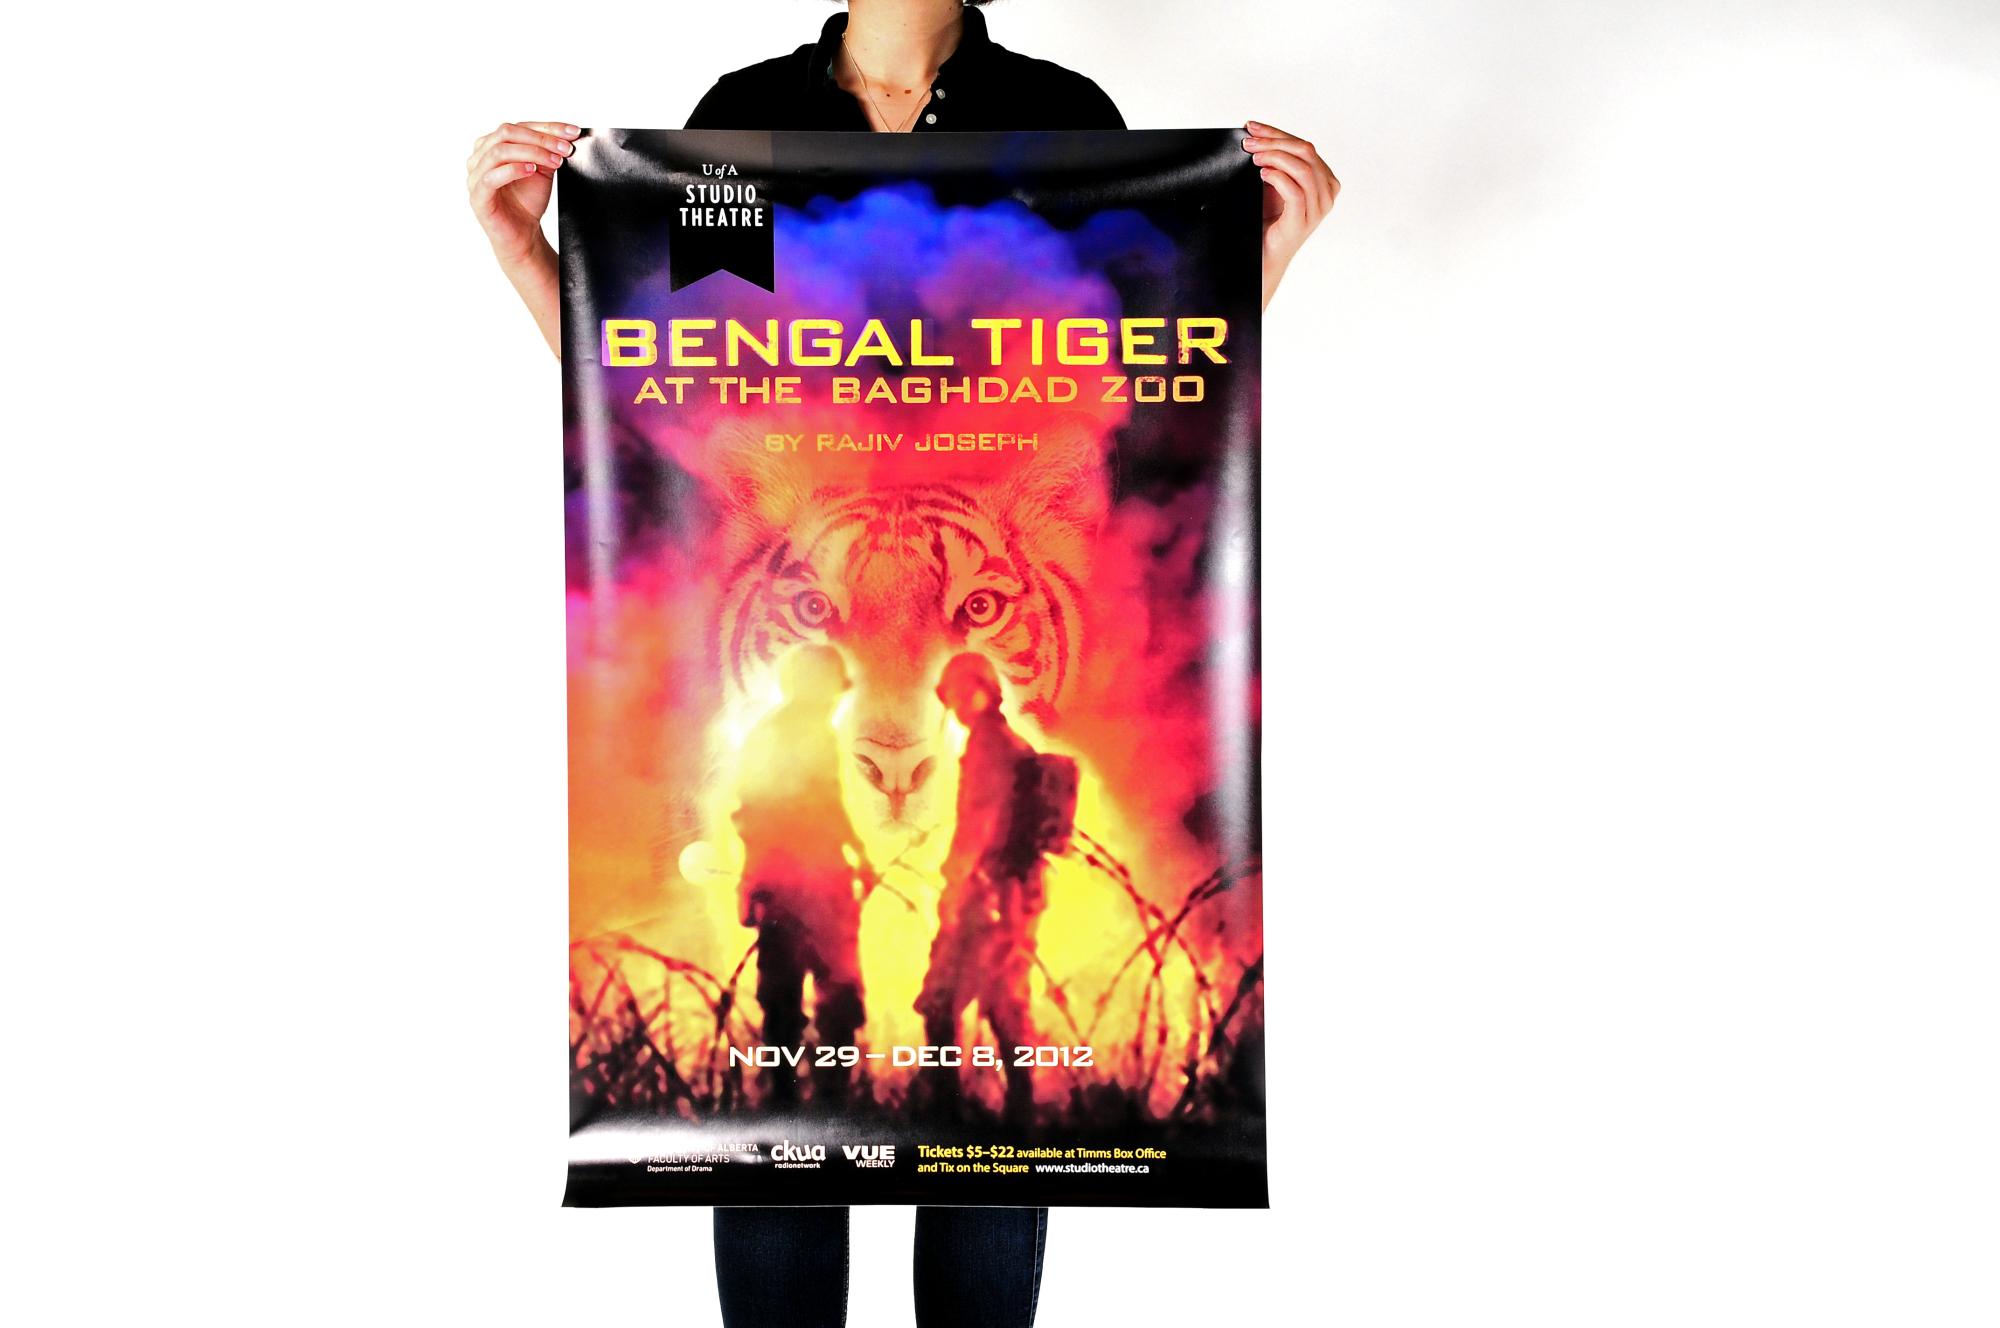 Bengal Tiger at the Baghdad Zoo